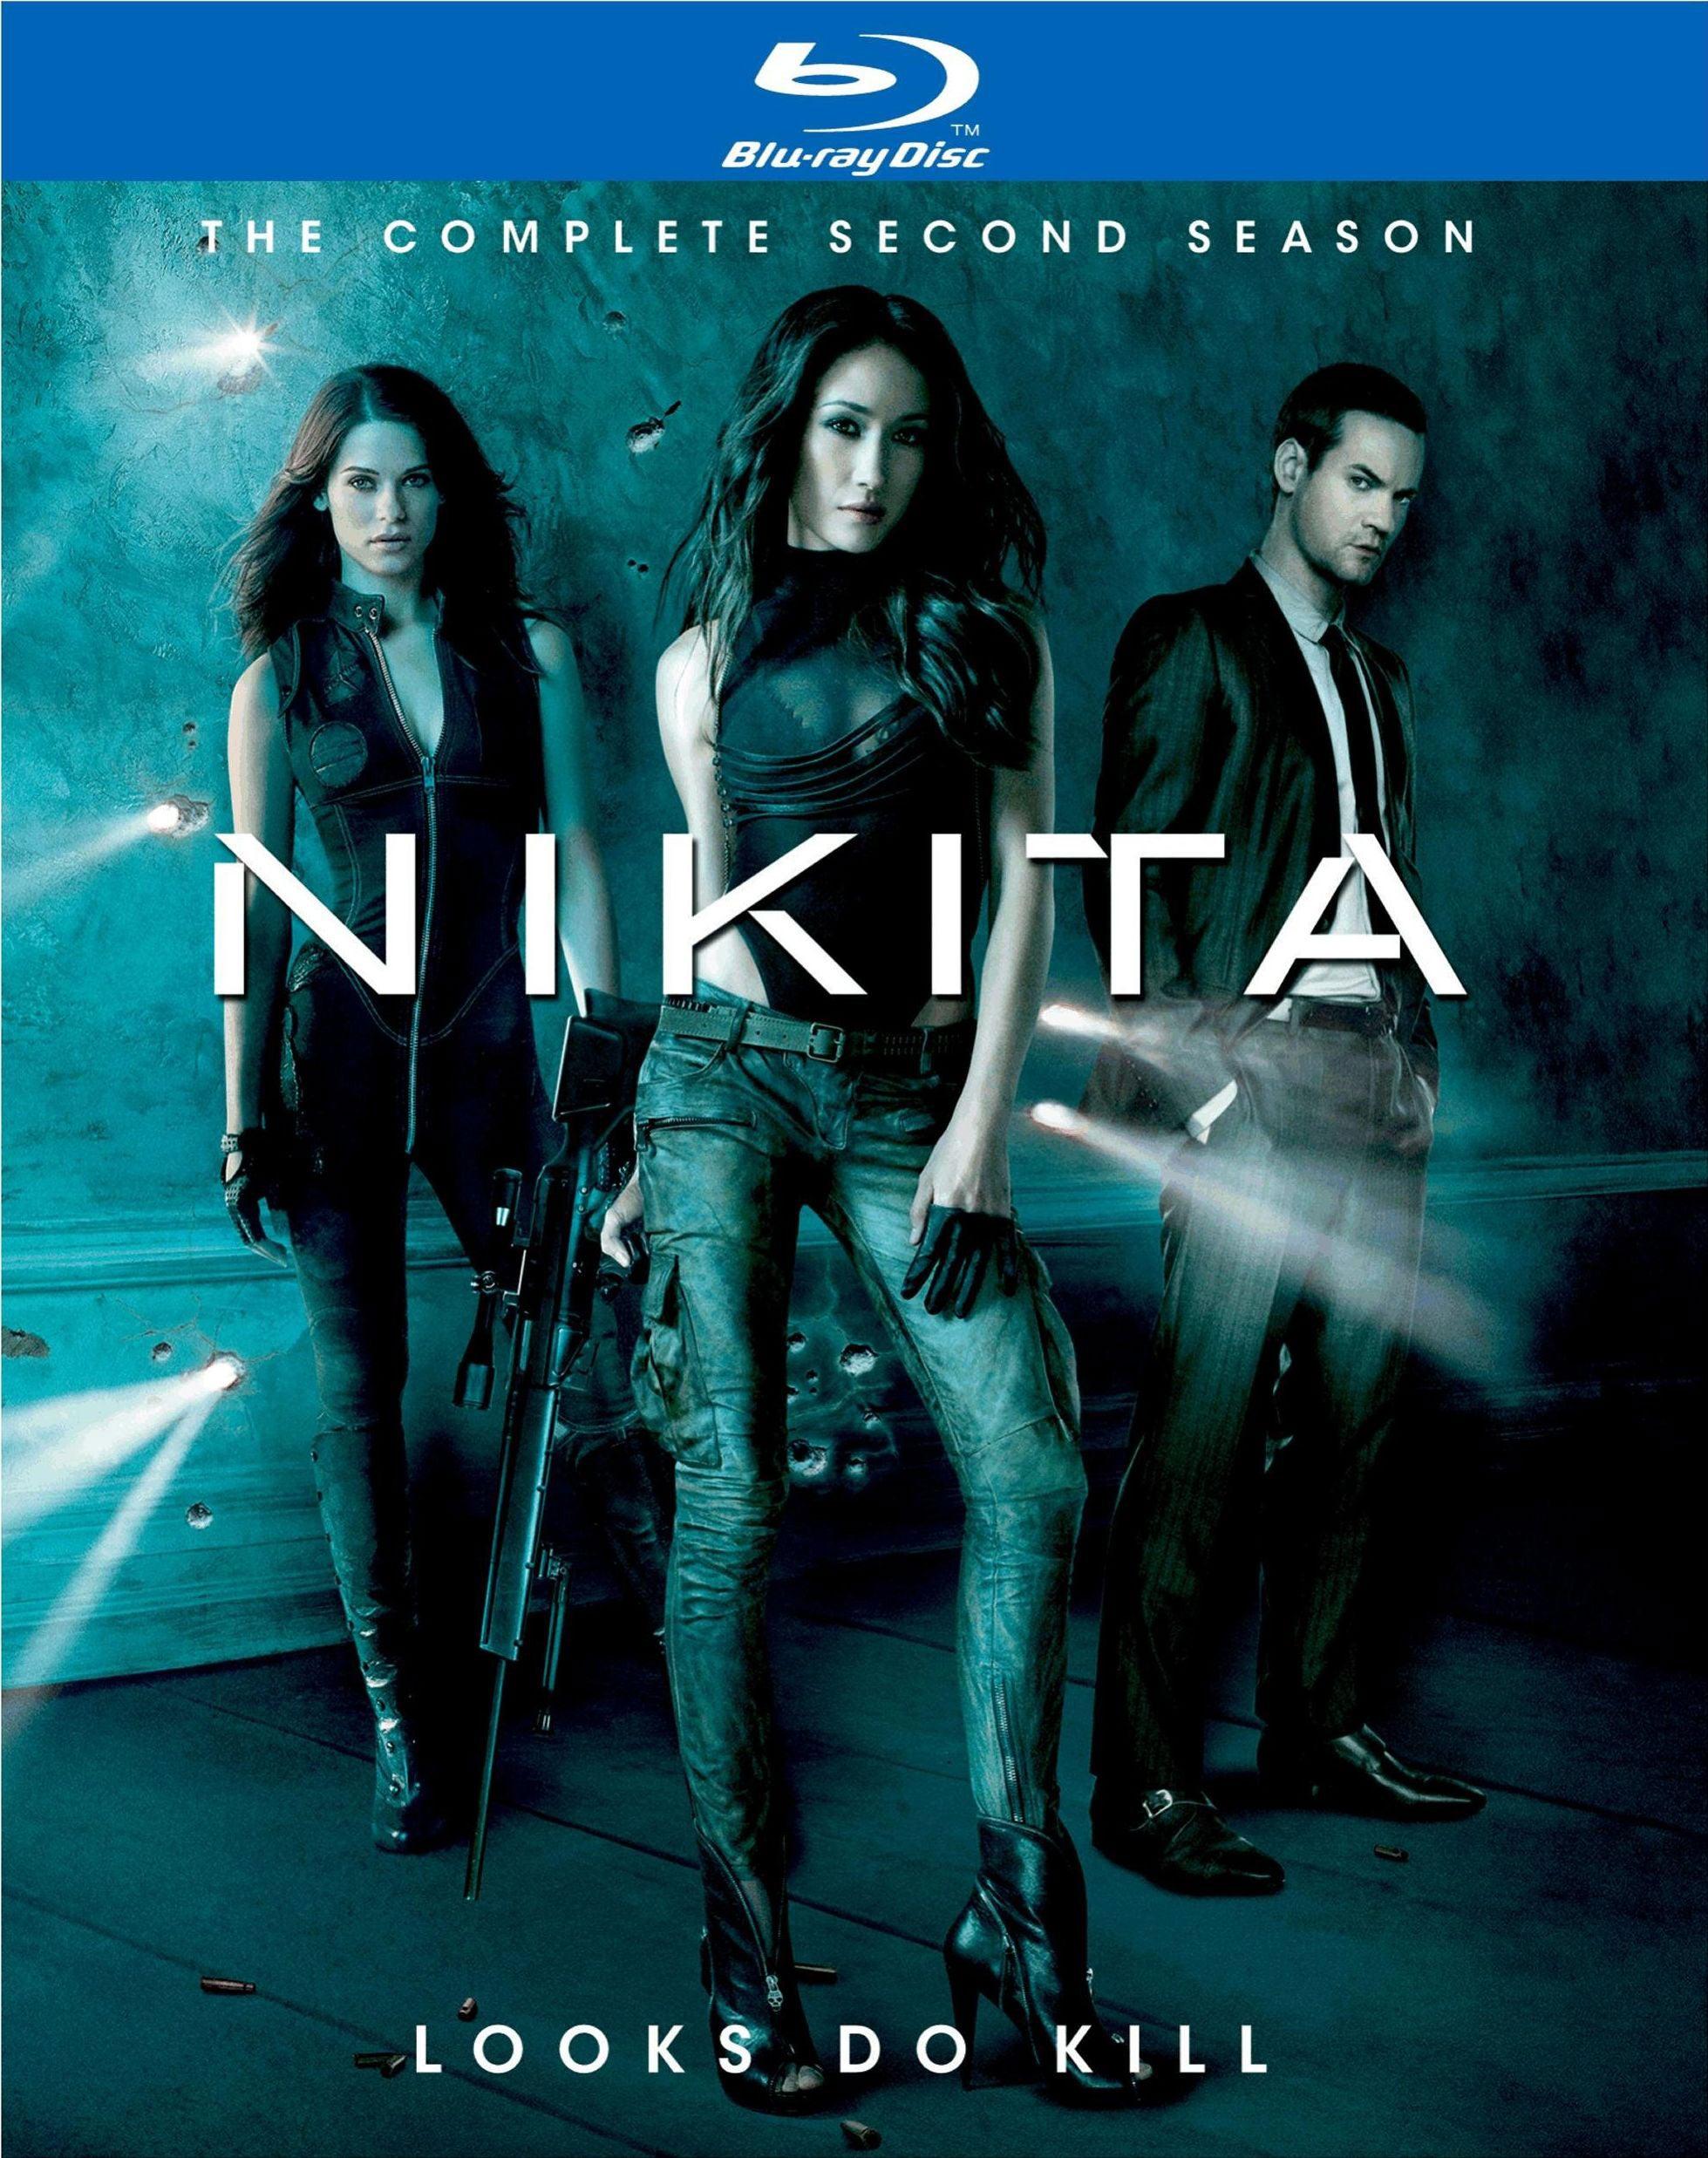 Nikita: The Complete Second Season (Blu-ray Disc)